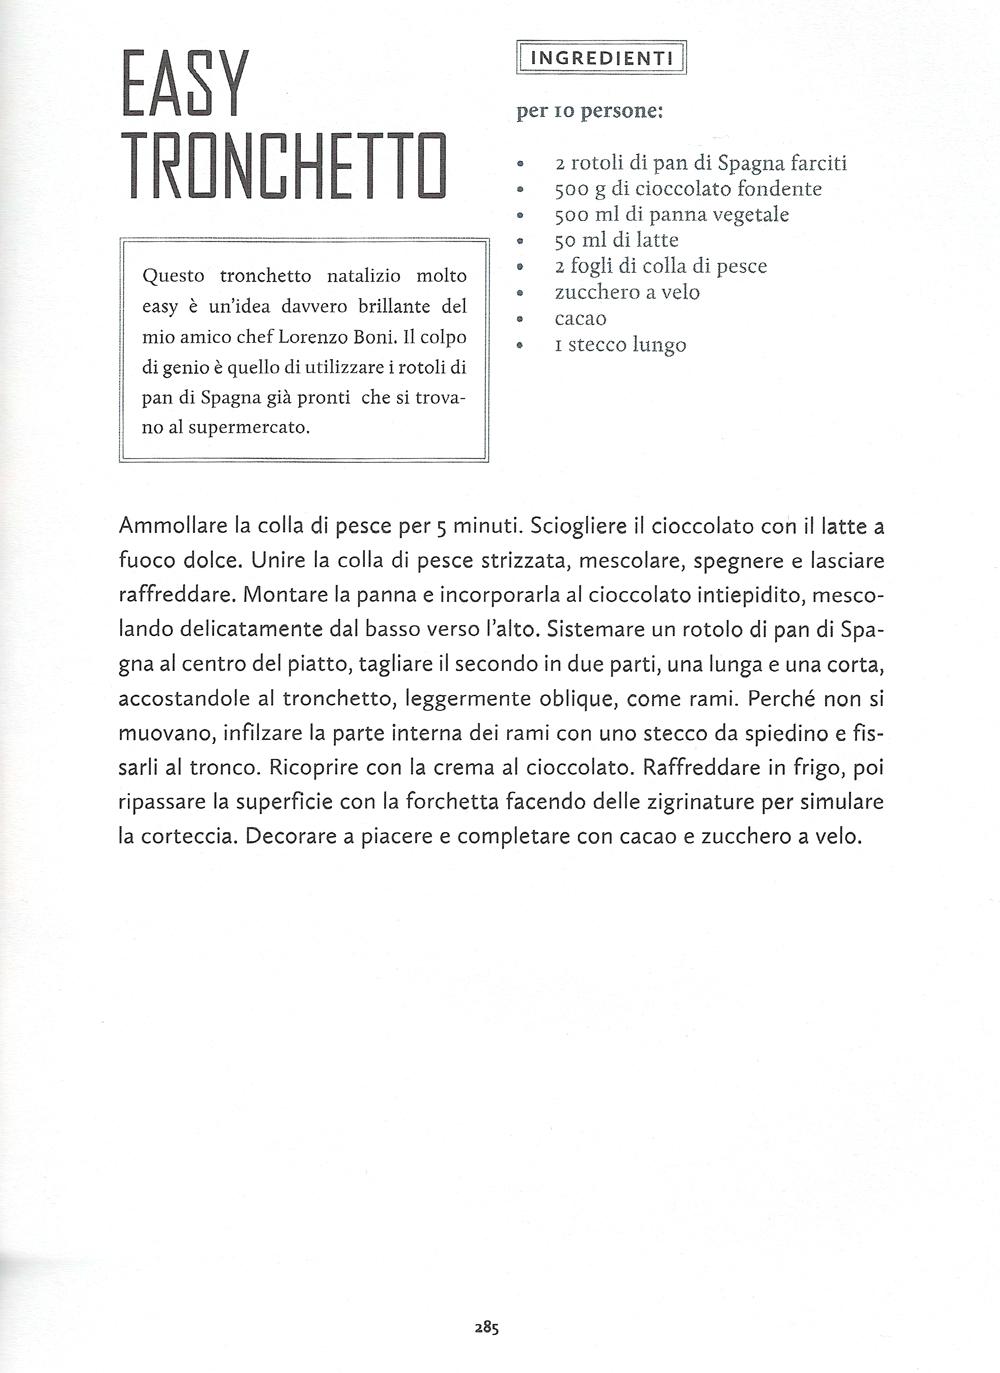 easy-tronchetto-2